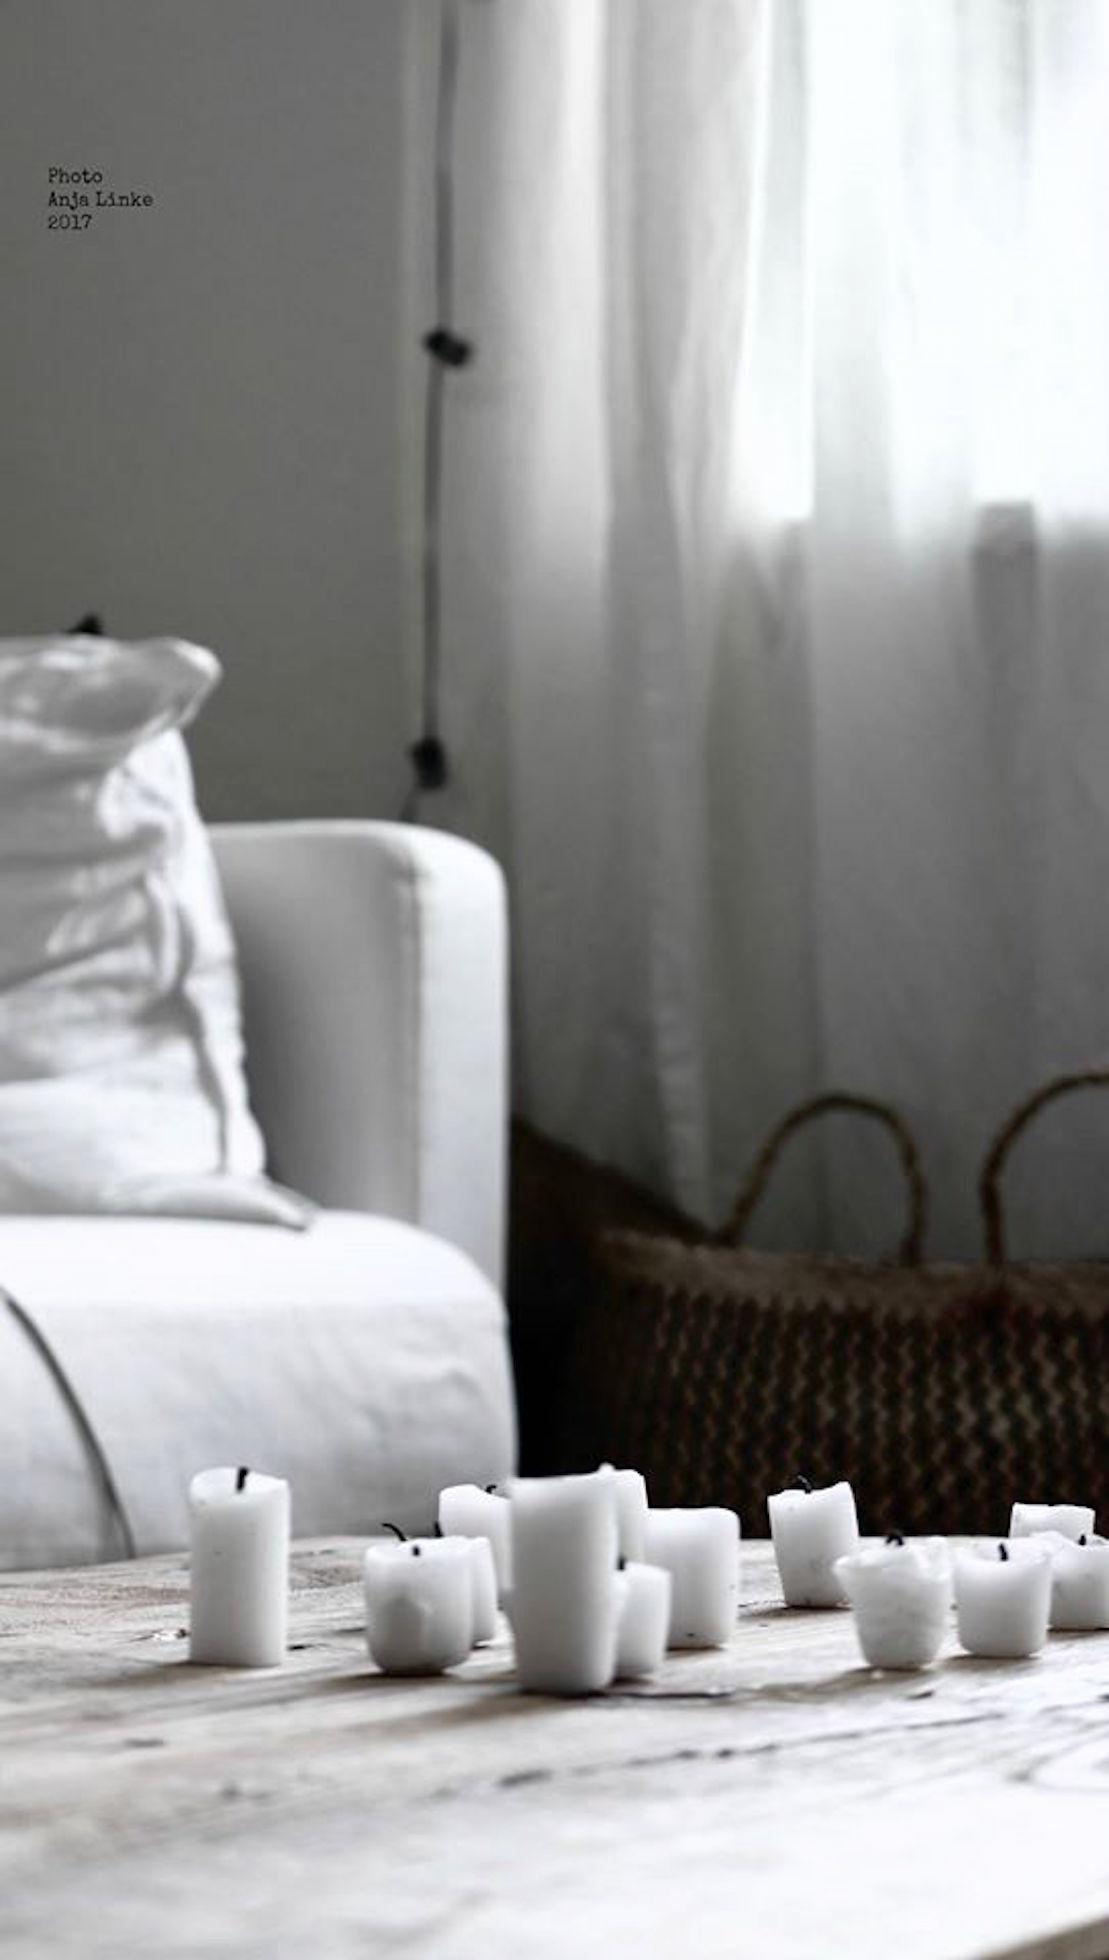 Silence Wohnzimmer Kissen Ikea Kerzendeko CAnja Linke